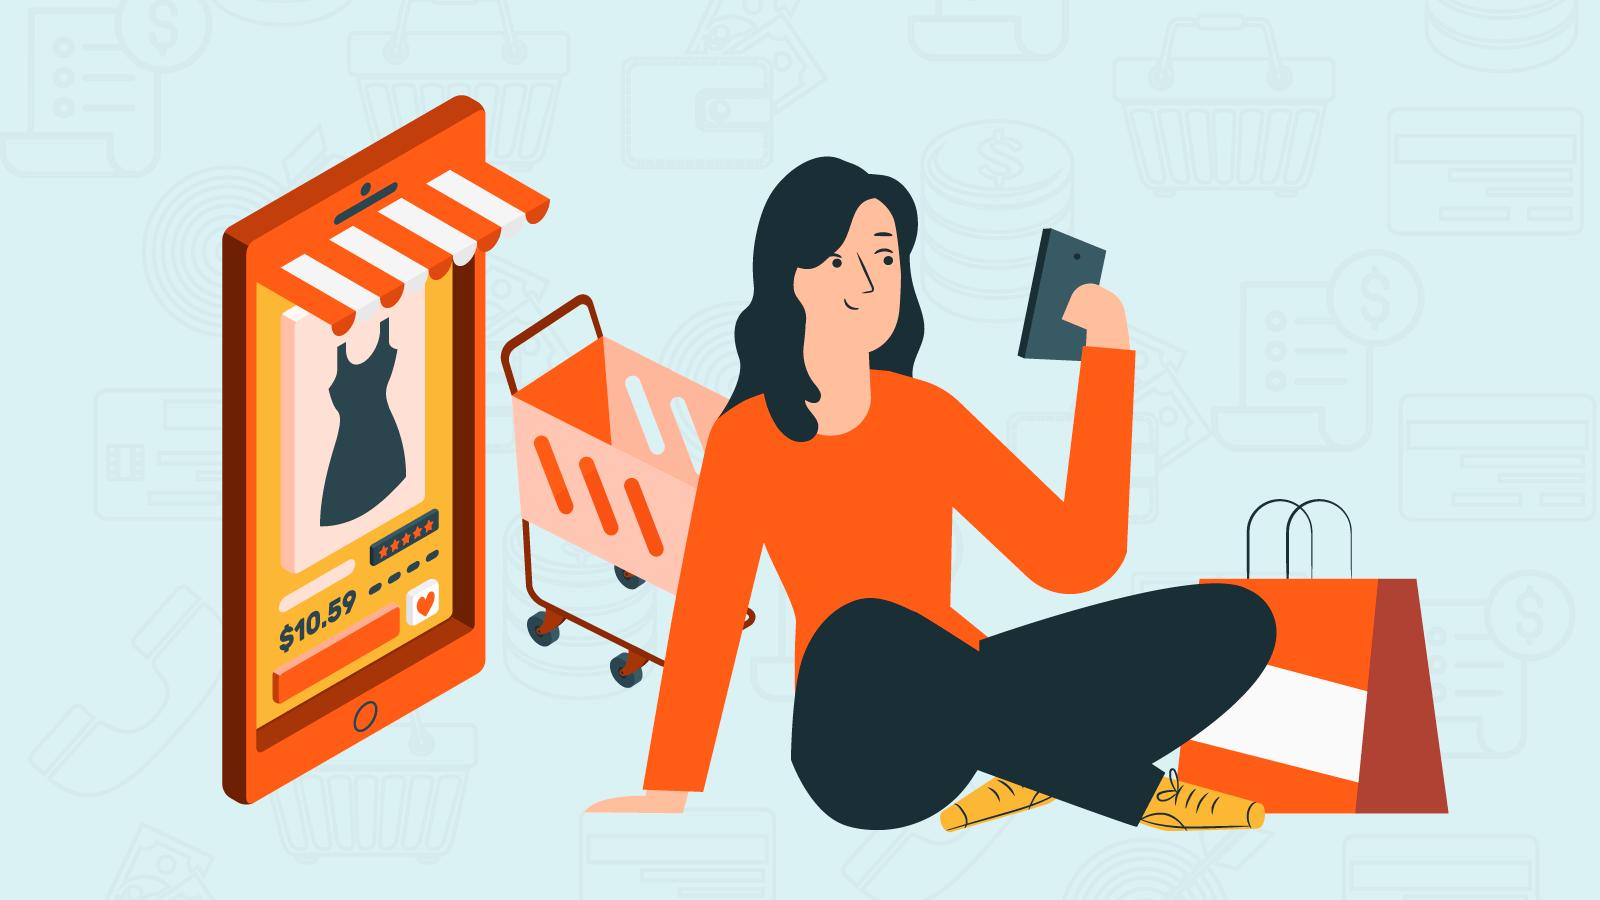 programa-punto-de venta-para-negocio-pequeno